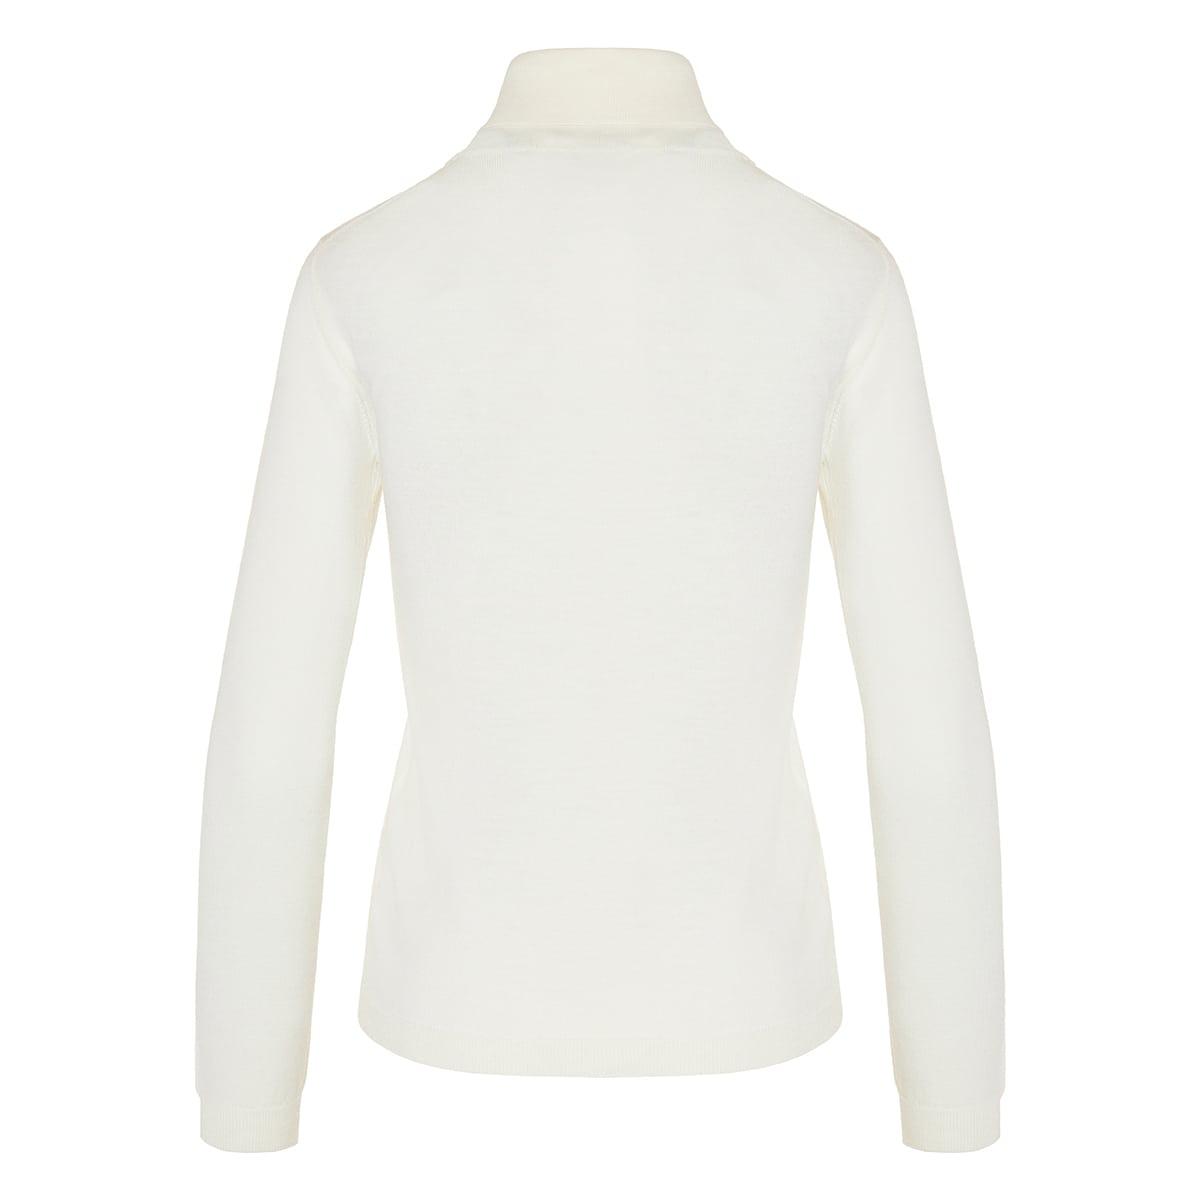 The Arianna wool sweater